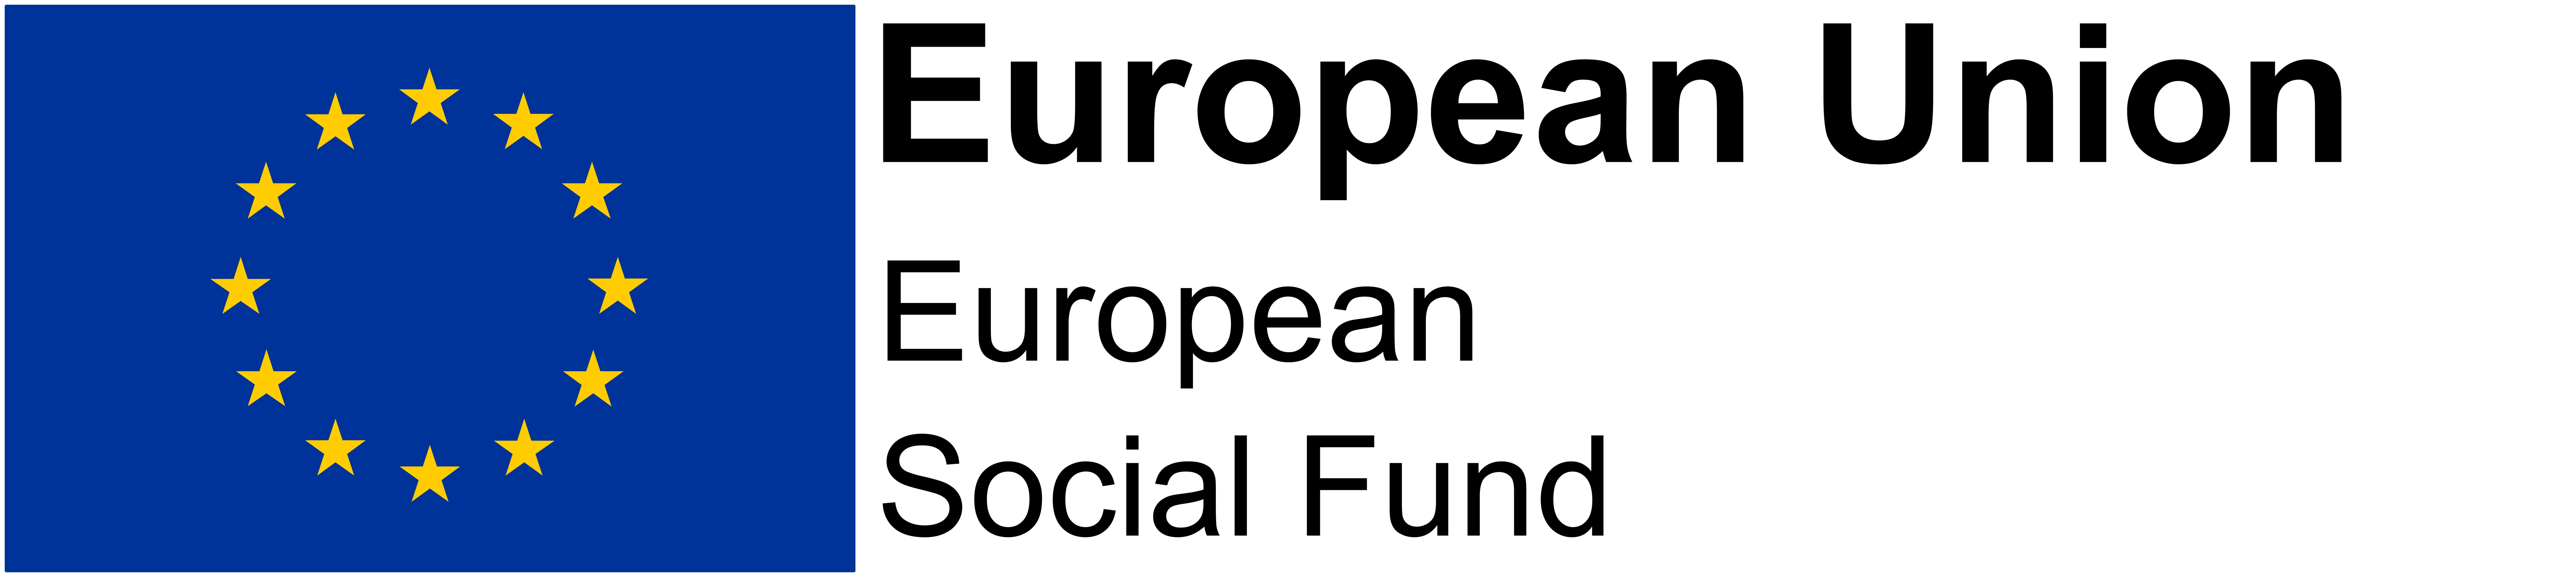 European Social Fund logo